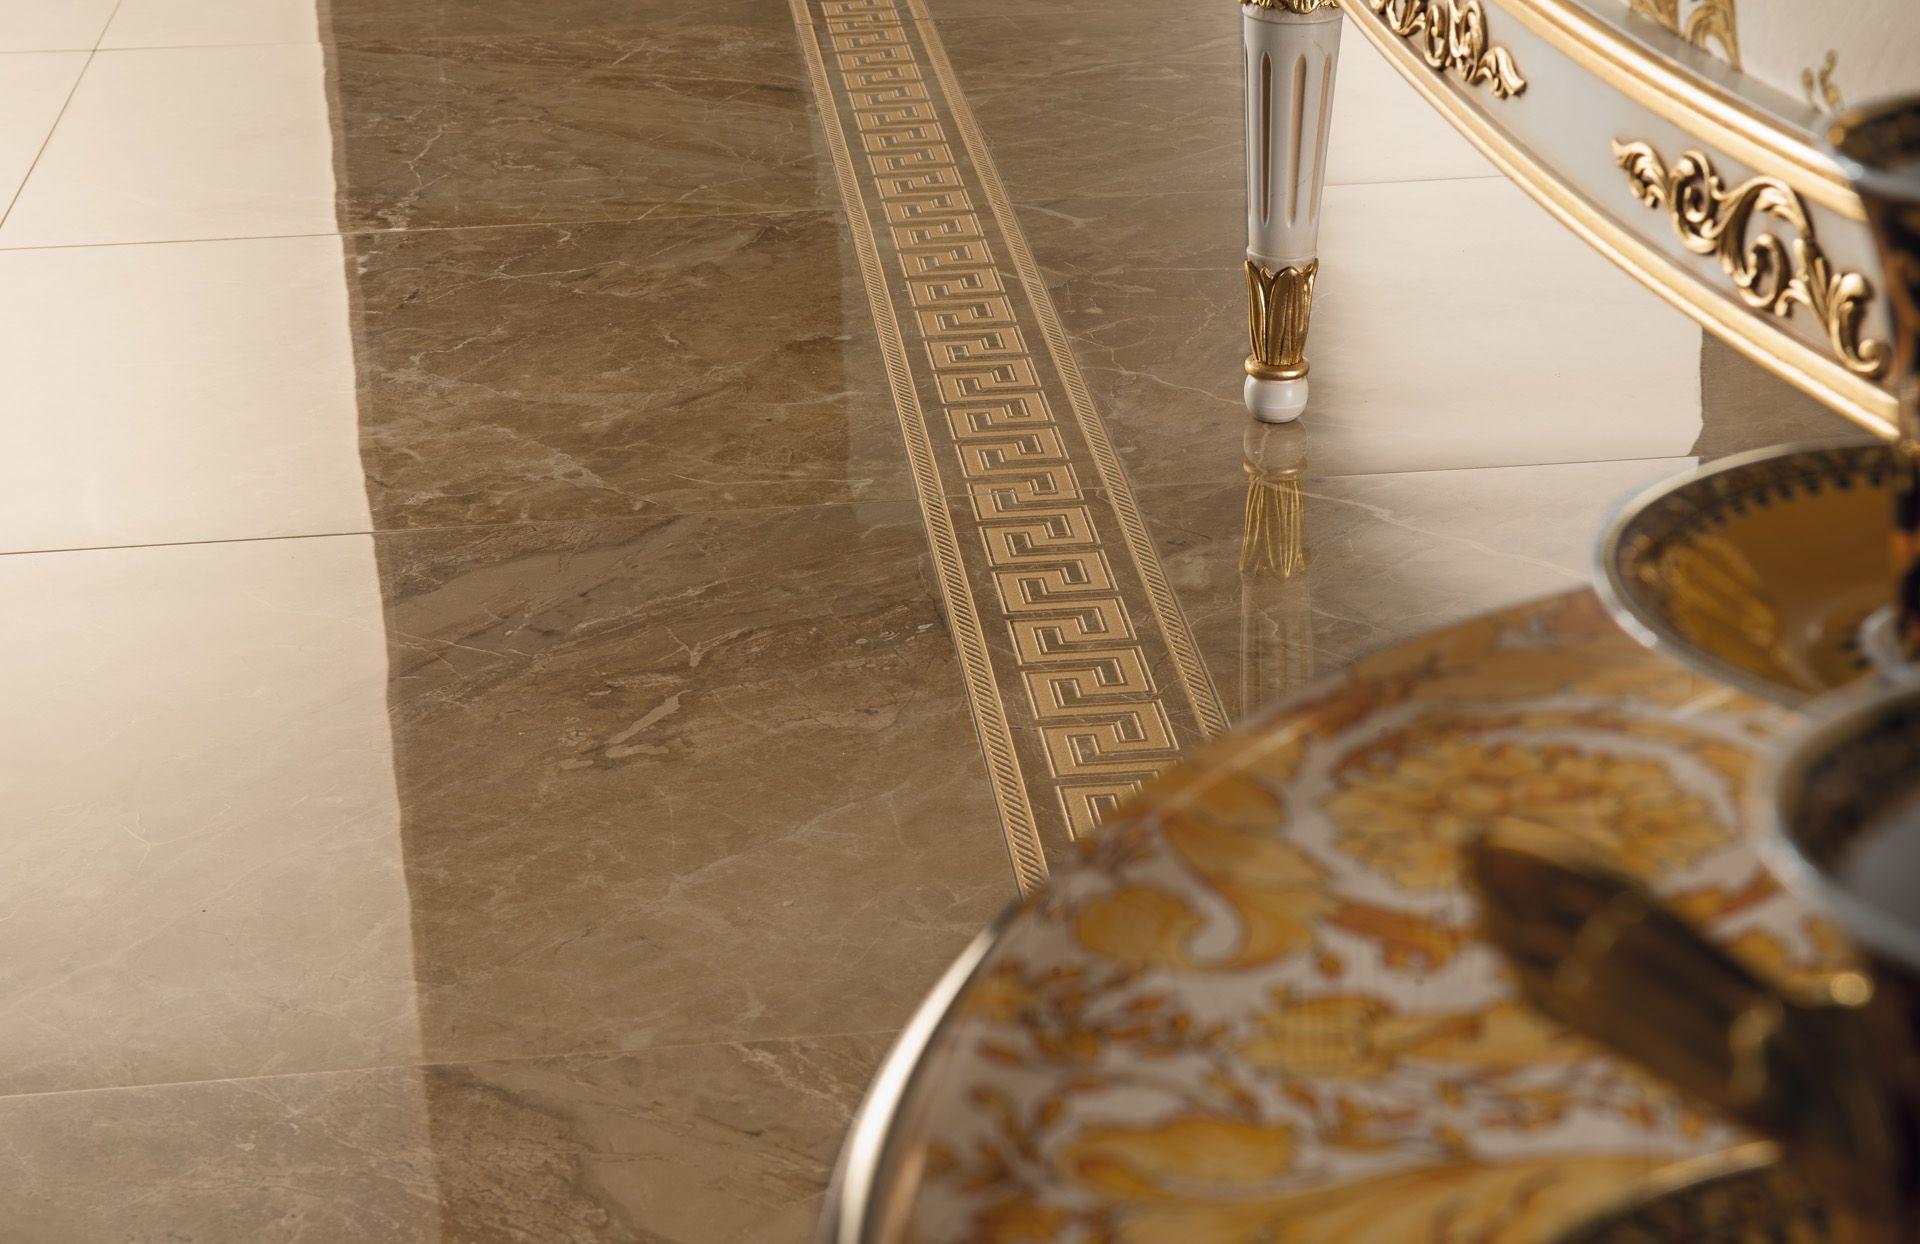 Or Gold Carrelage Marble47 Versace Carrelage Marbre Maison Versace Carrelage